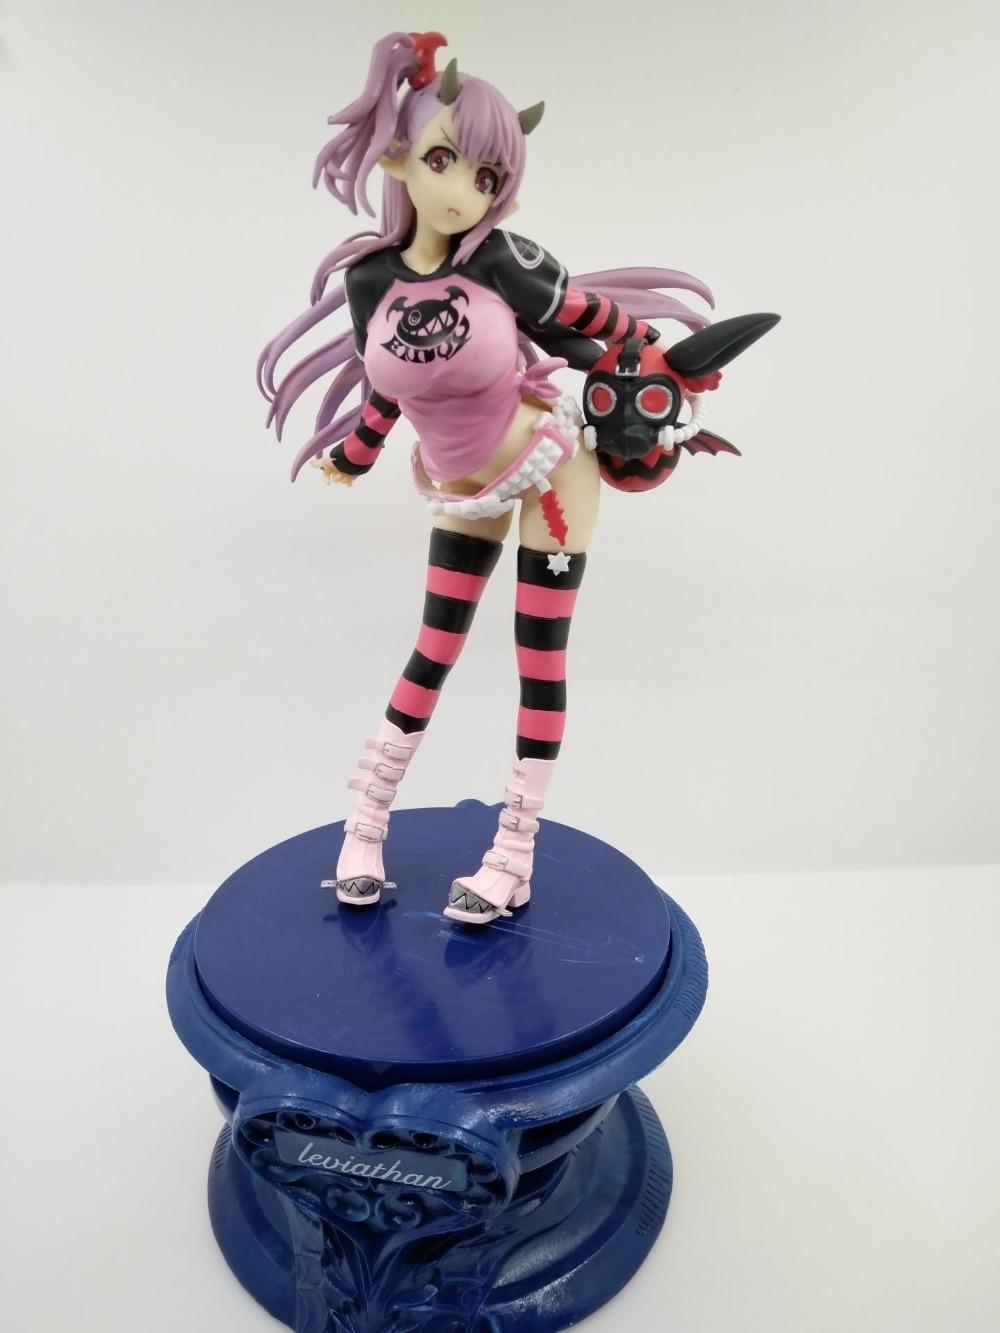 The Seven Deadly Sins Nanatsu no Taizai Serpent's Sin of Envy Leviathan 22cm PVC Action Figure Doll Toys nakaba suzuki the seven deadly sins 4